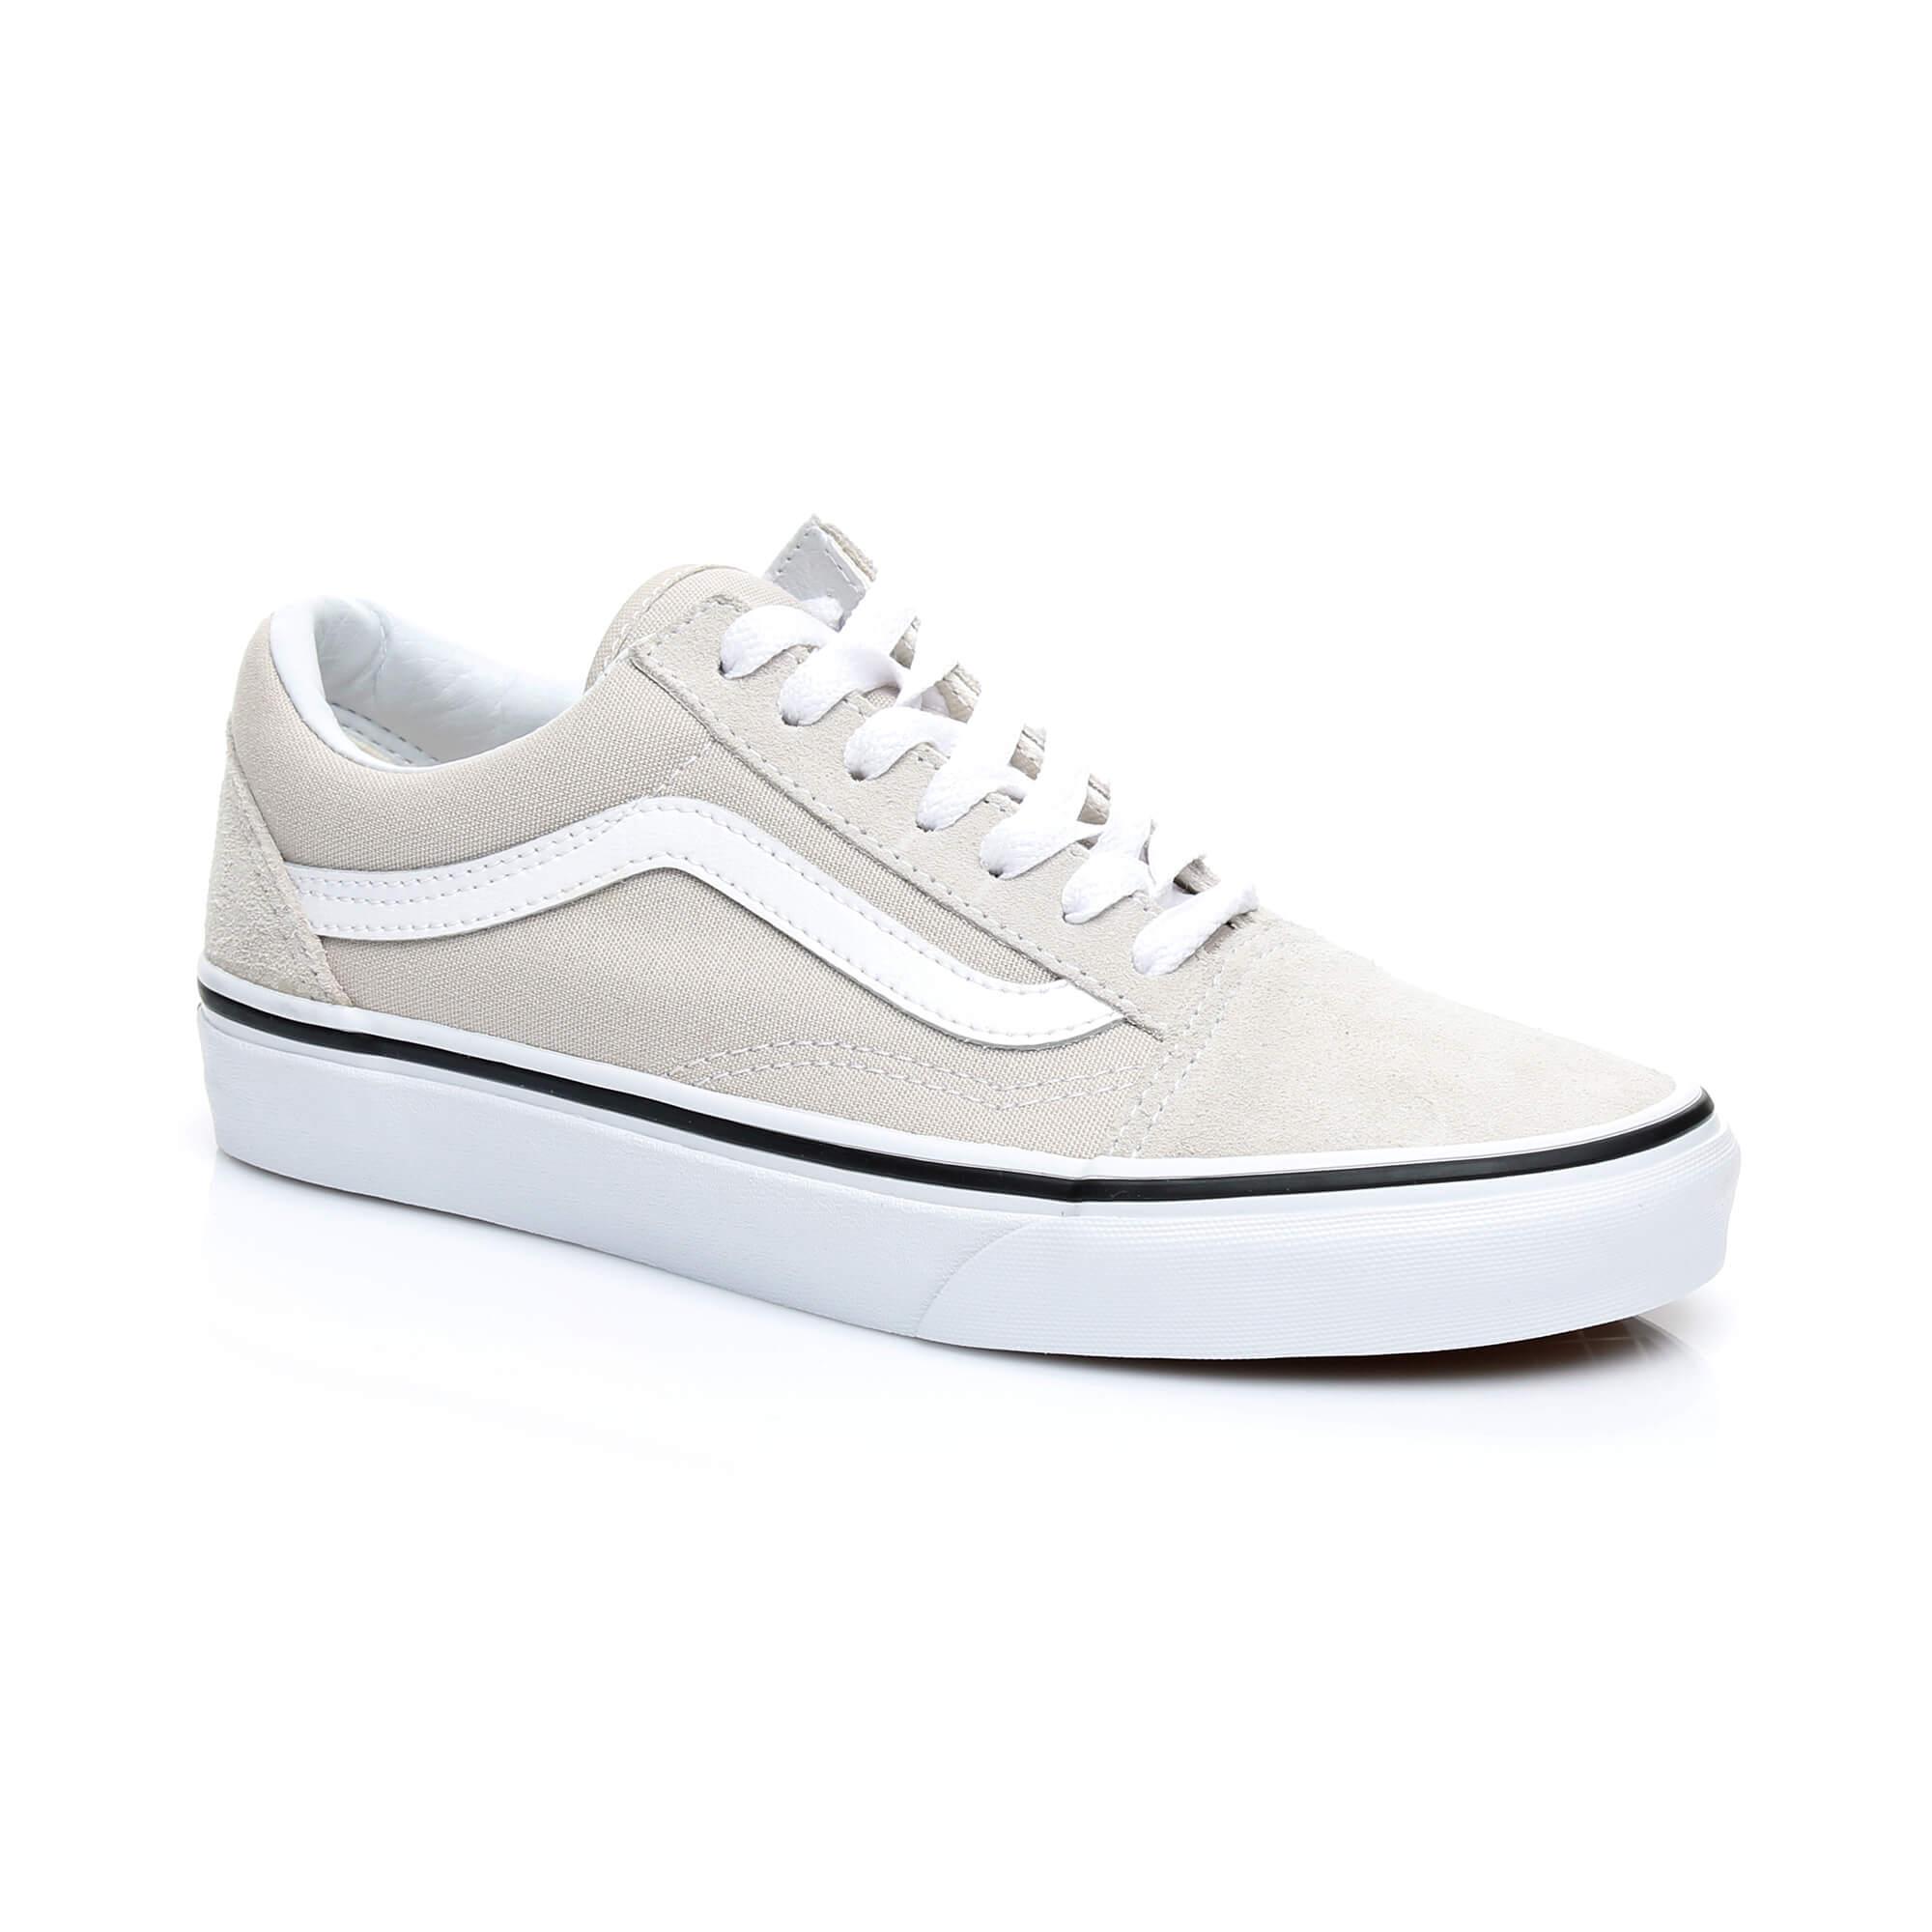 2c139f6bf42f39 Vans Ua Old Skool Unisex Beyaz Sneaker Kadin Sneaker 3150248